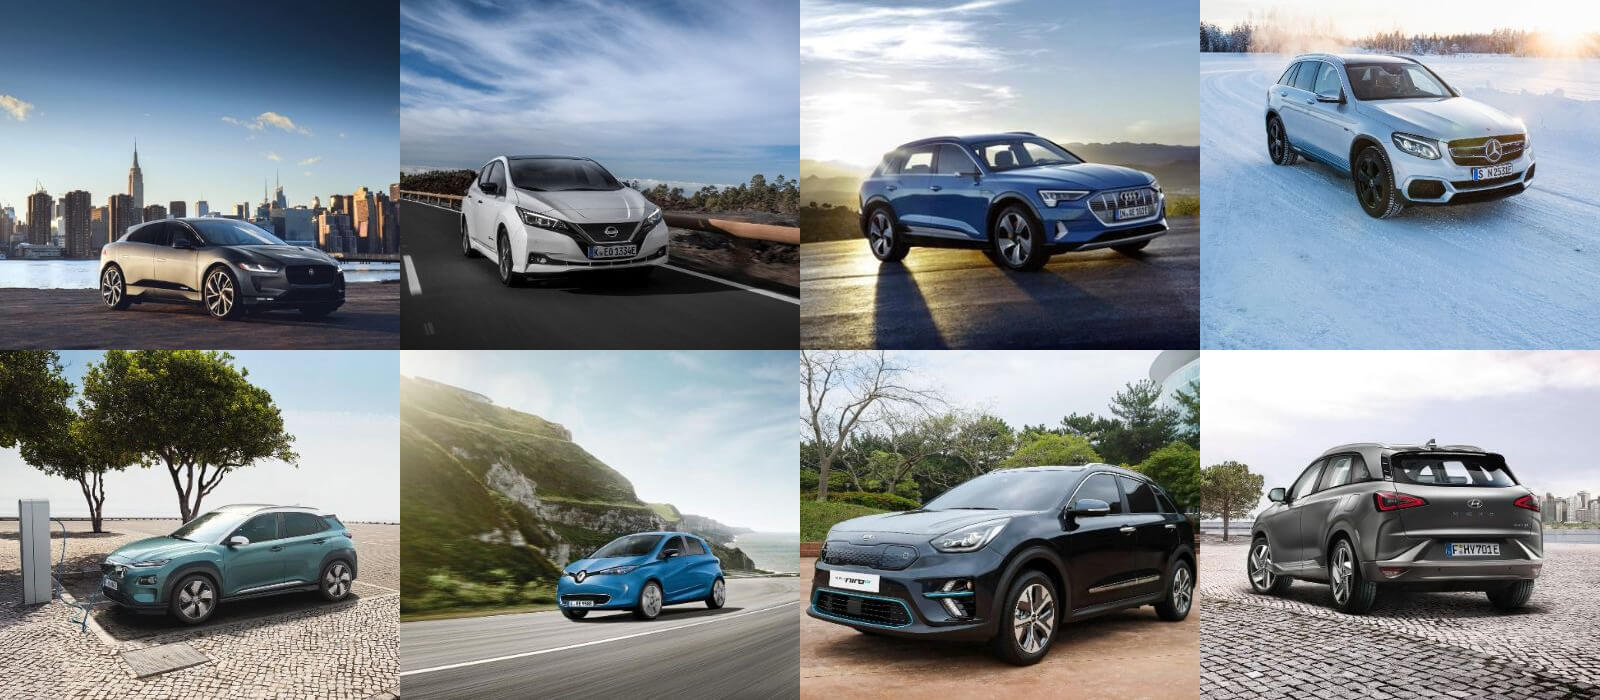 Neue Elektroautos in 2018 (Collage)